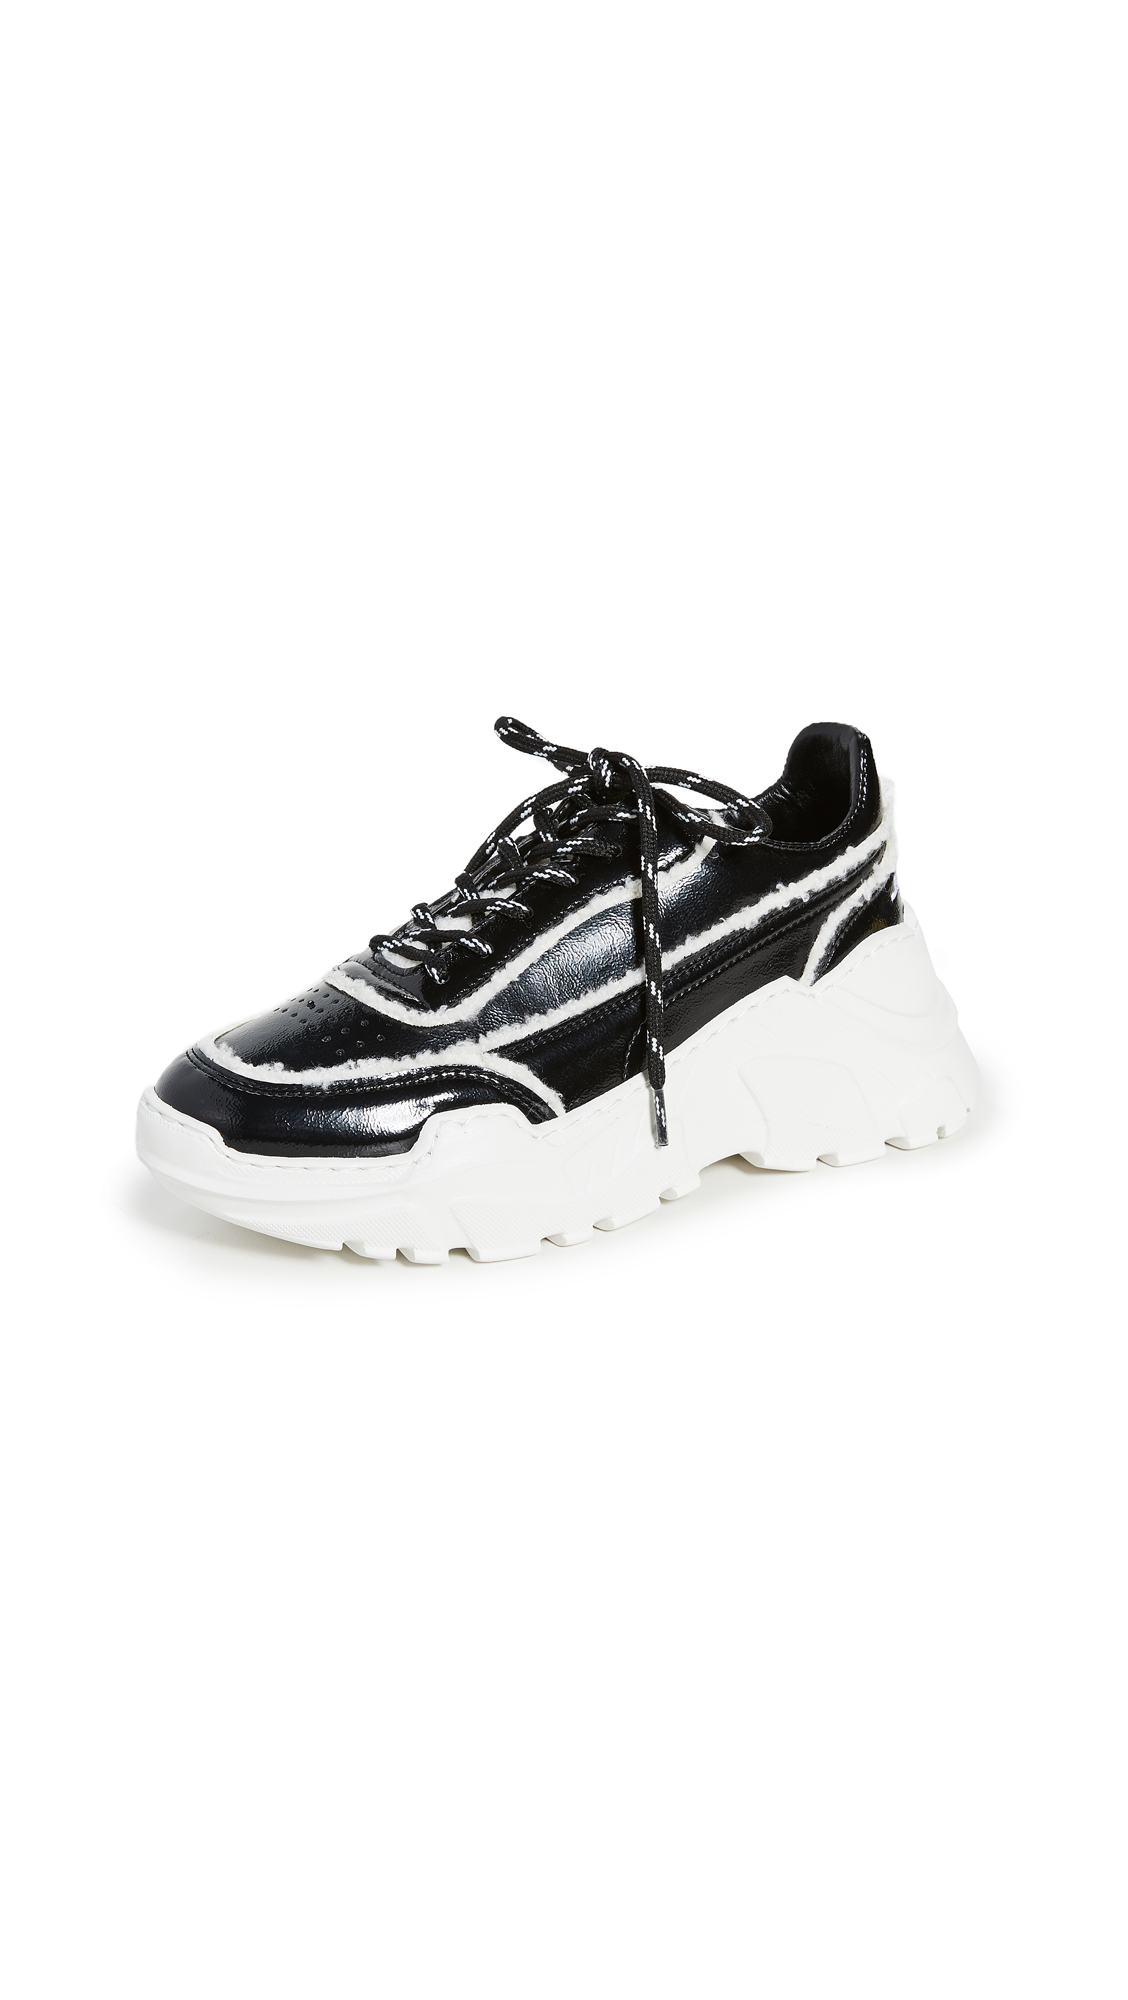 Joshua Sanders Zenith Classic Donna Sneakers – 60% Off Sale